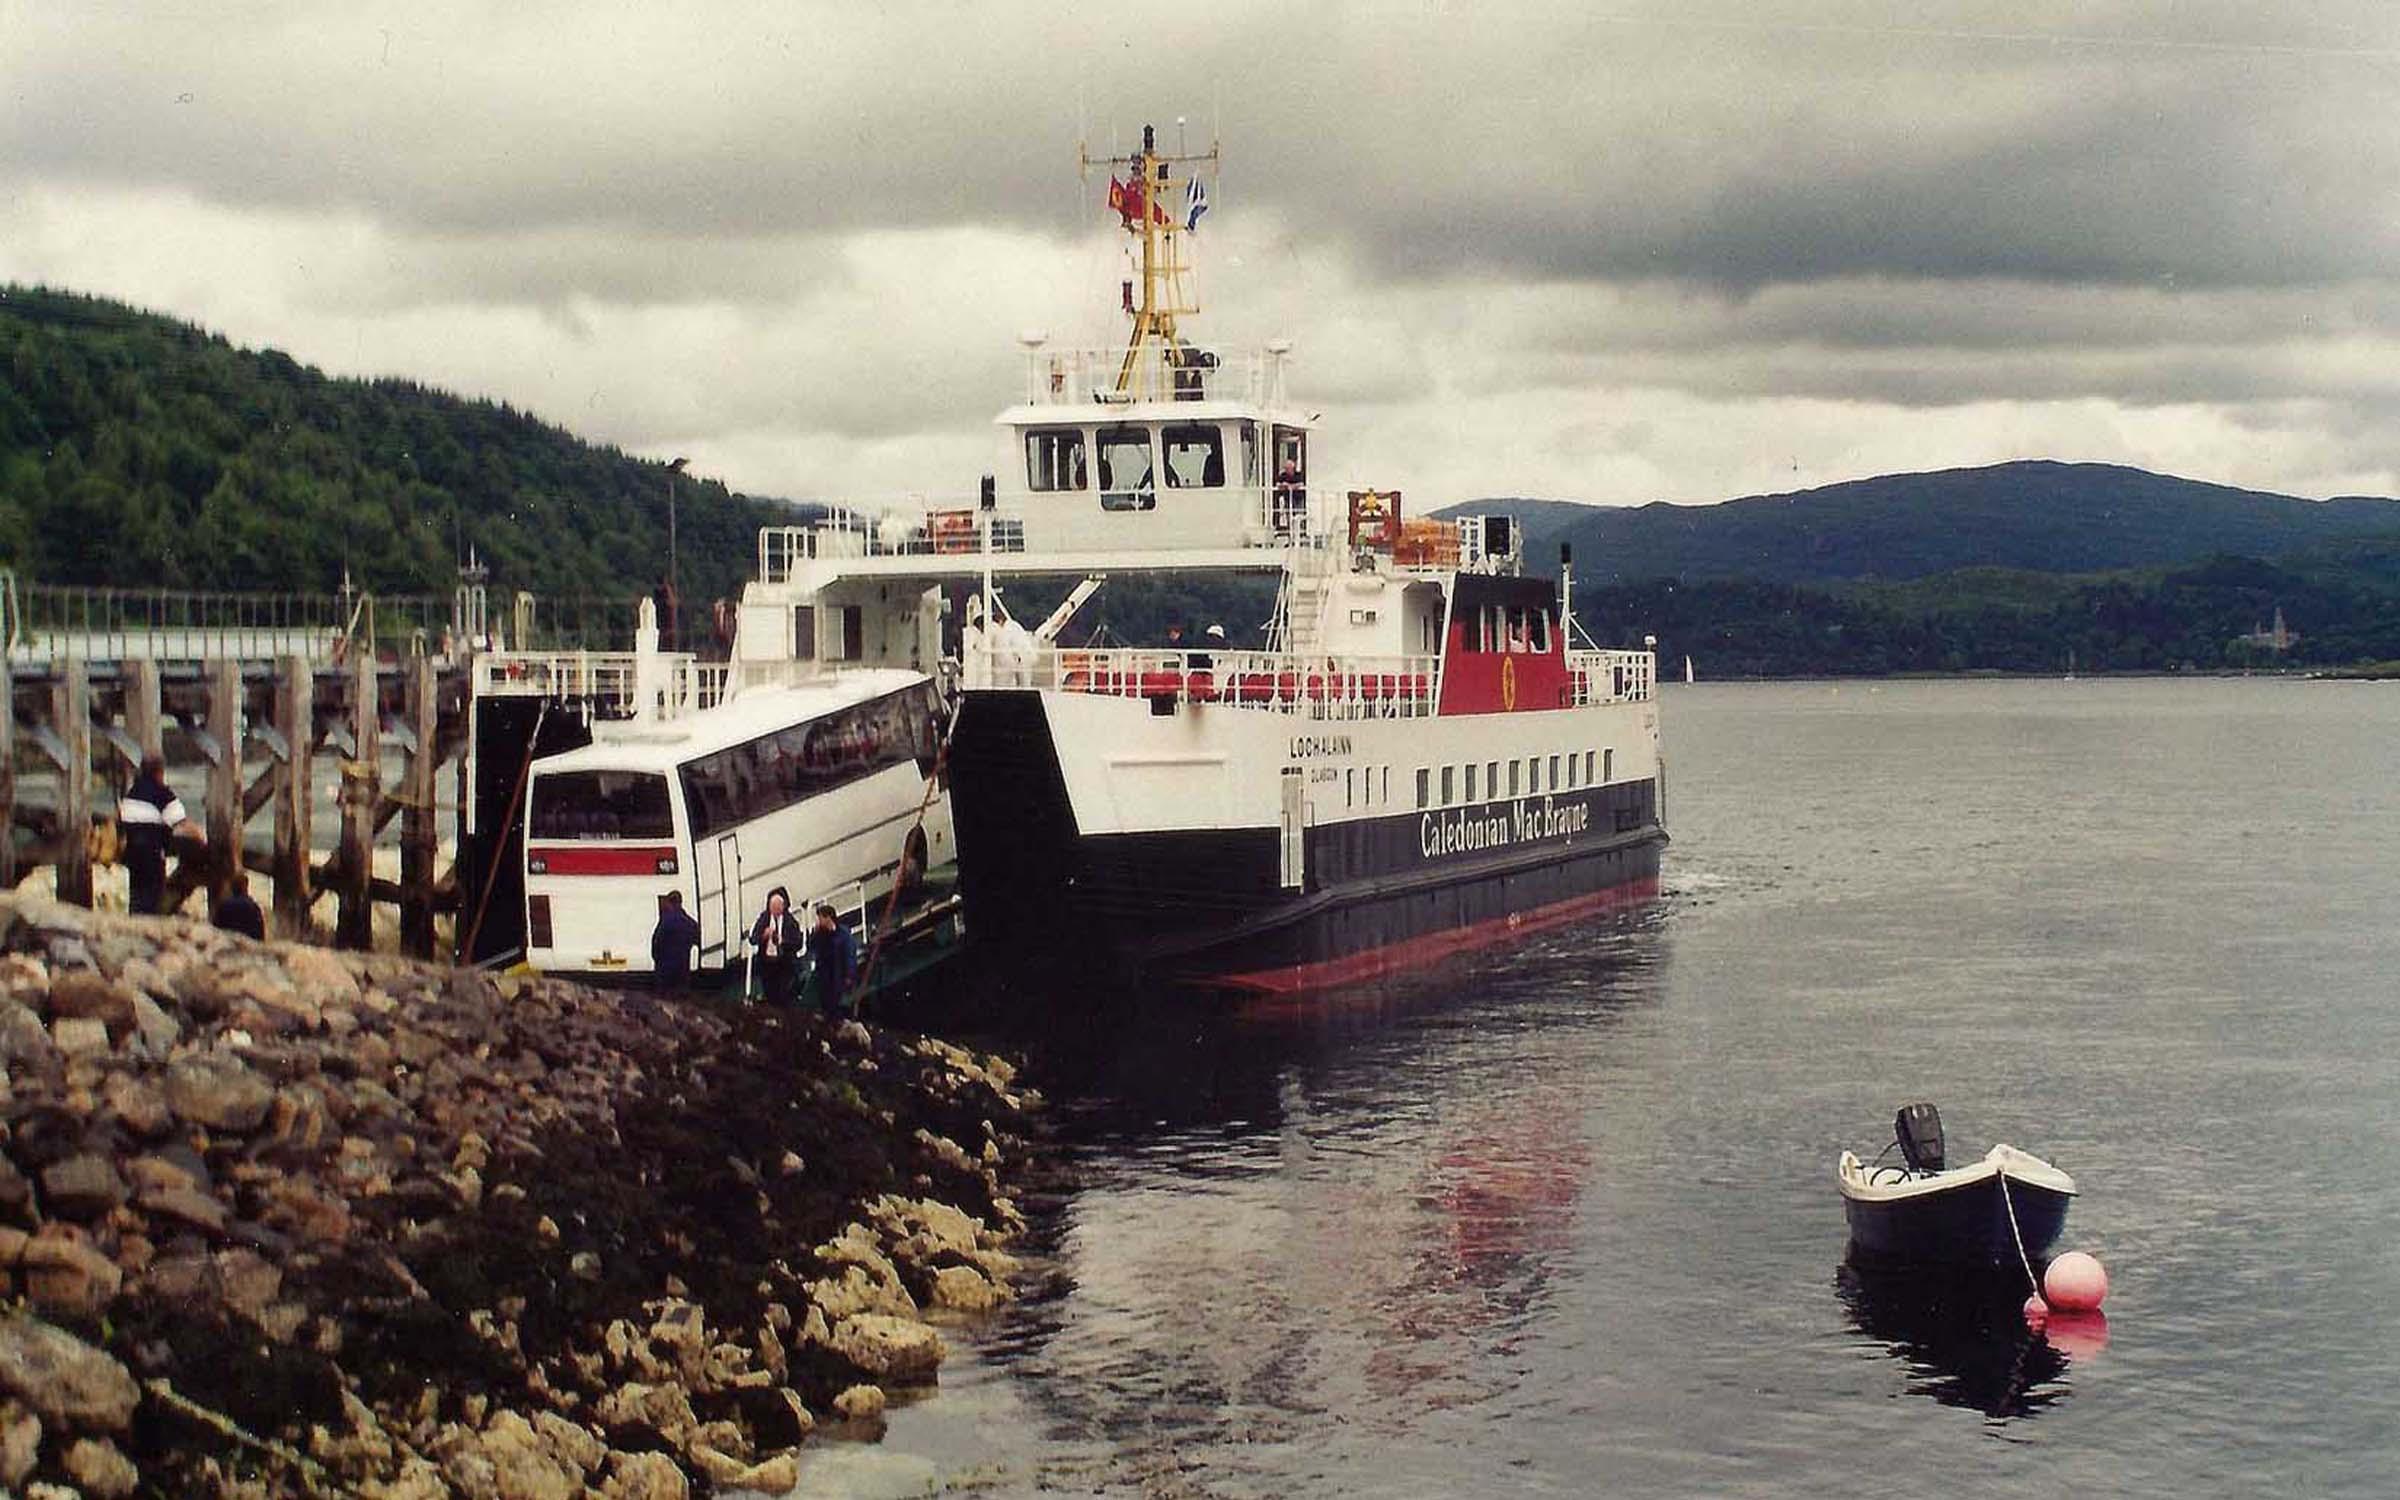 Loch Alainn loading at Lochaline (Iain McPherson)